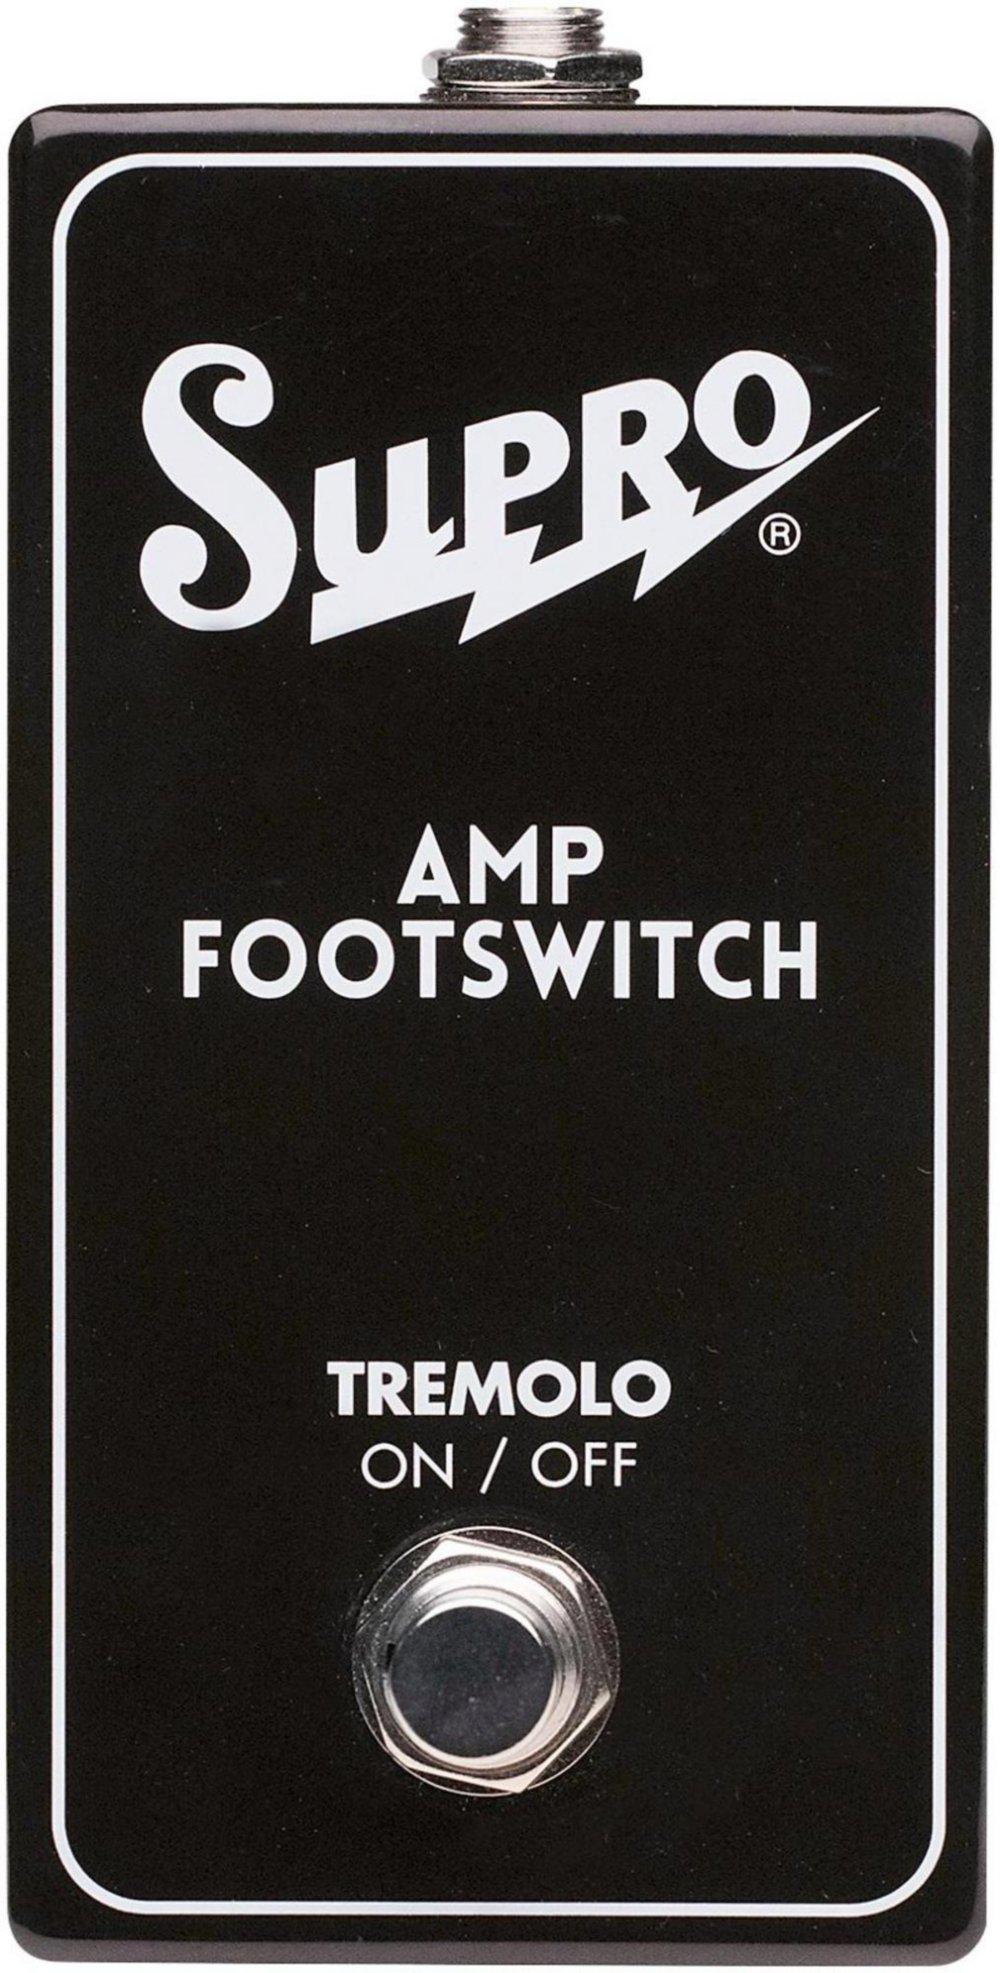 Supro SF1 Tremolo On/Off Switch for Dual-Tone, Coronado and Black Magick by Supro (Image #1)